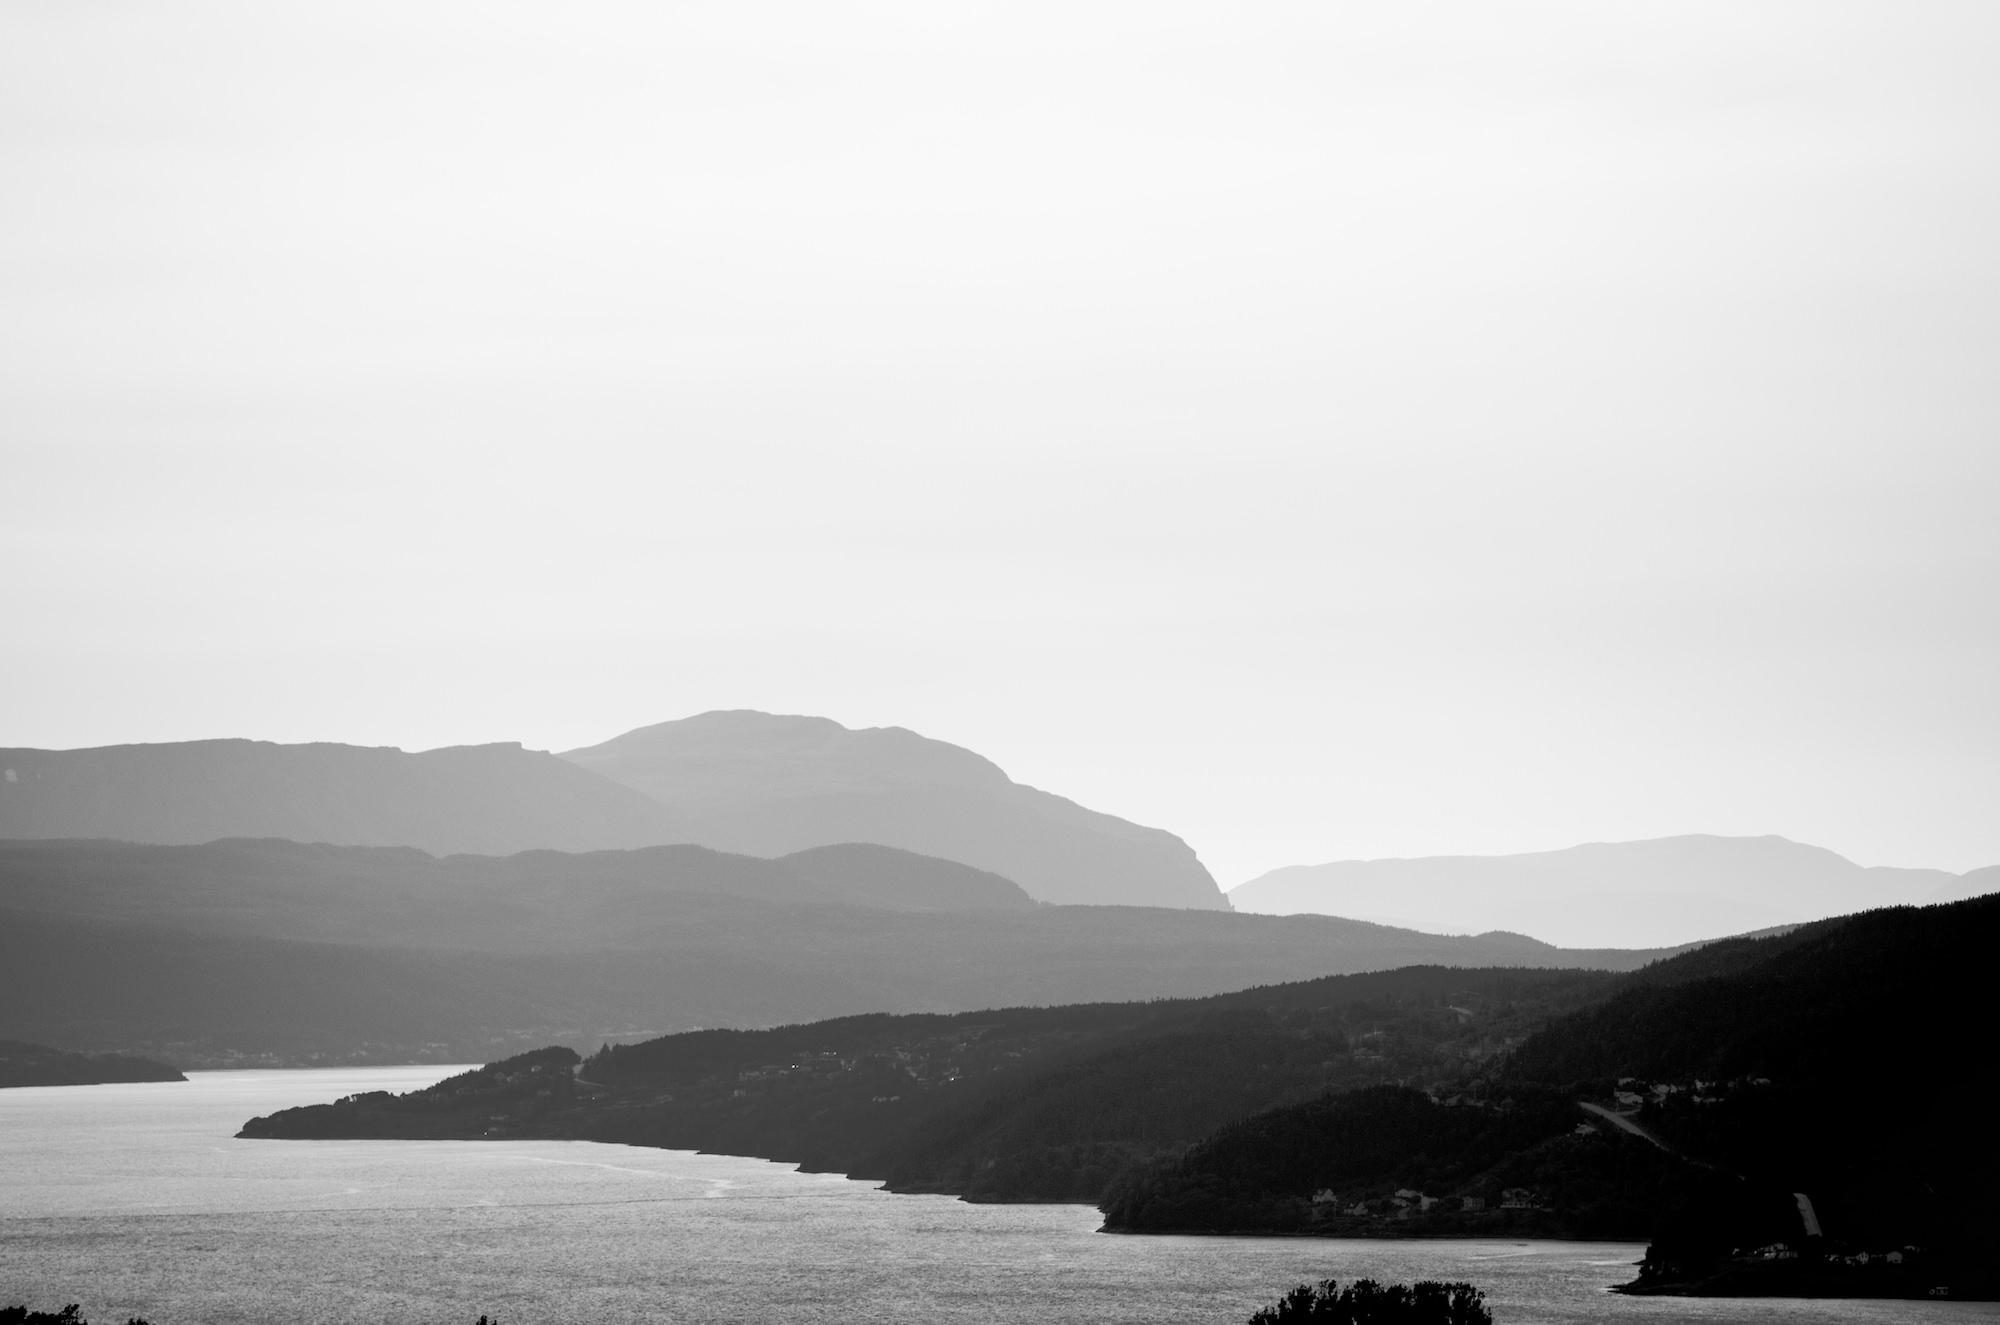 polar-visual-taylor-sheppard-photography-photo-video-motion-design-graphic-newfoundland-corner-brook-bay-port-black-white-landscape-nature.jpg